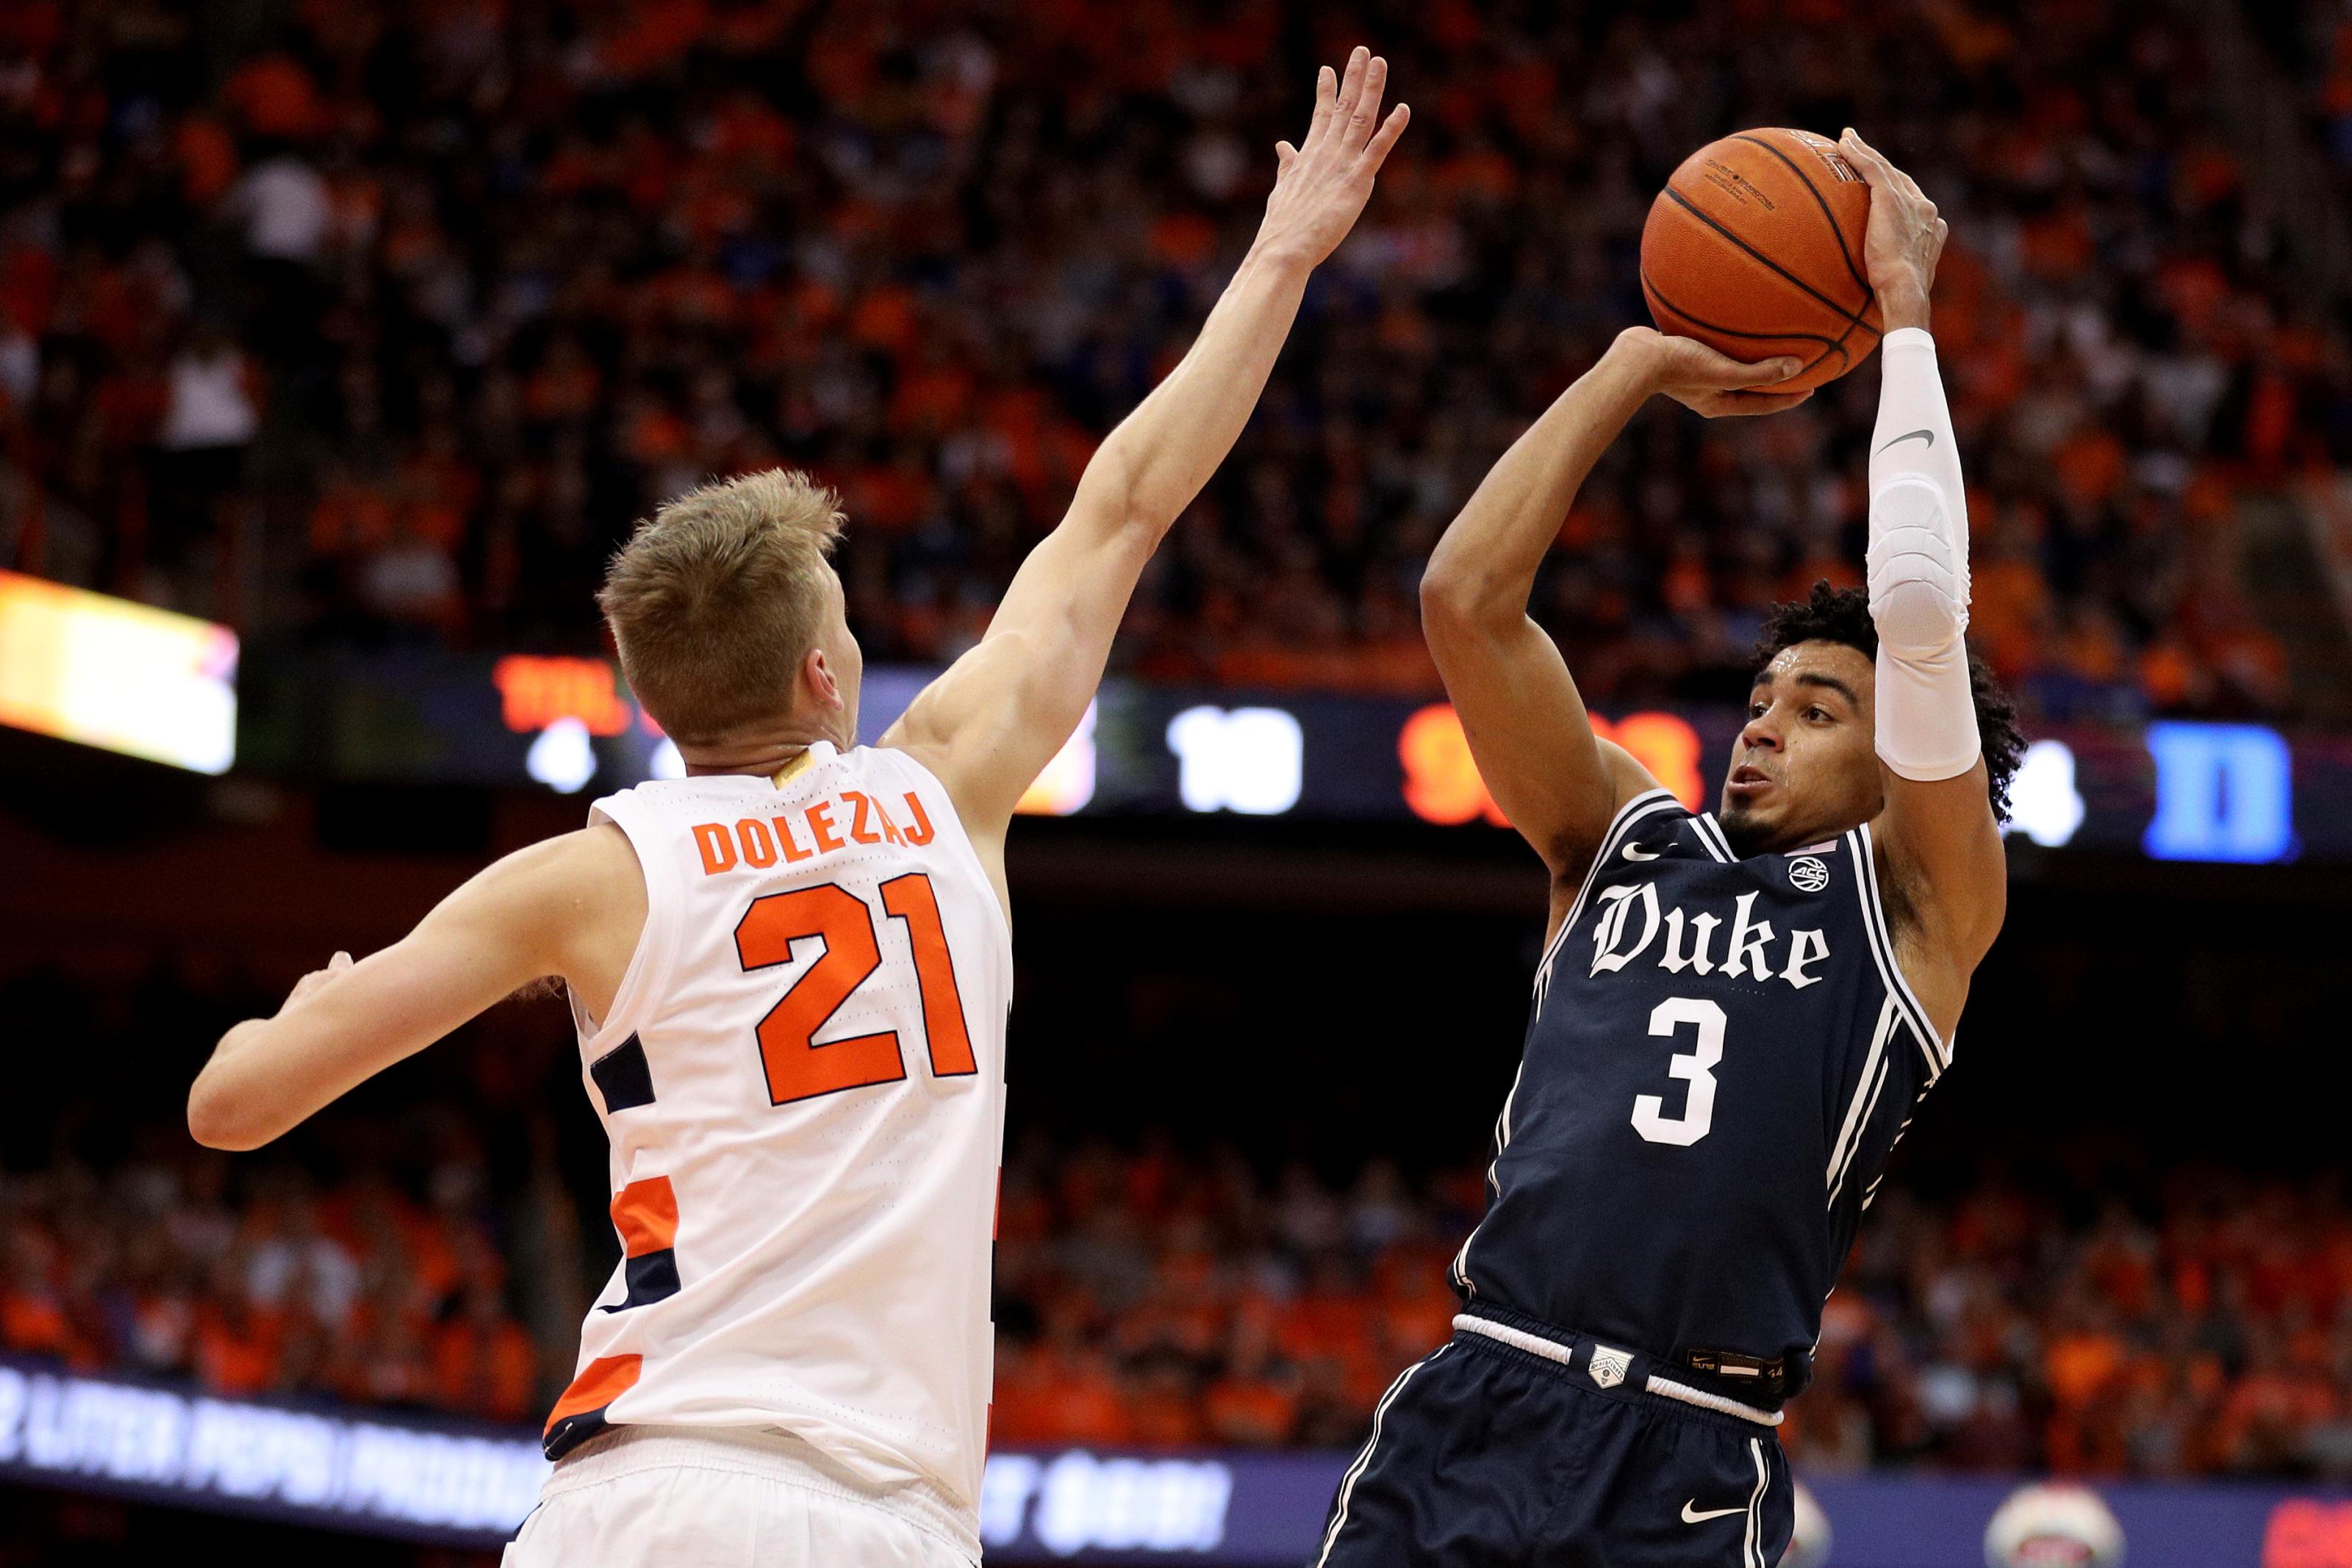 Who Won The Duke Carolina Basketball Game Last Night | Gameswalls.org